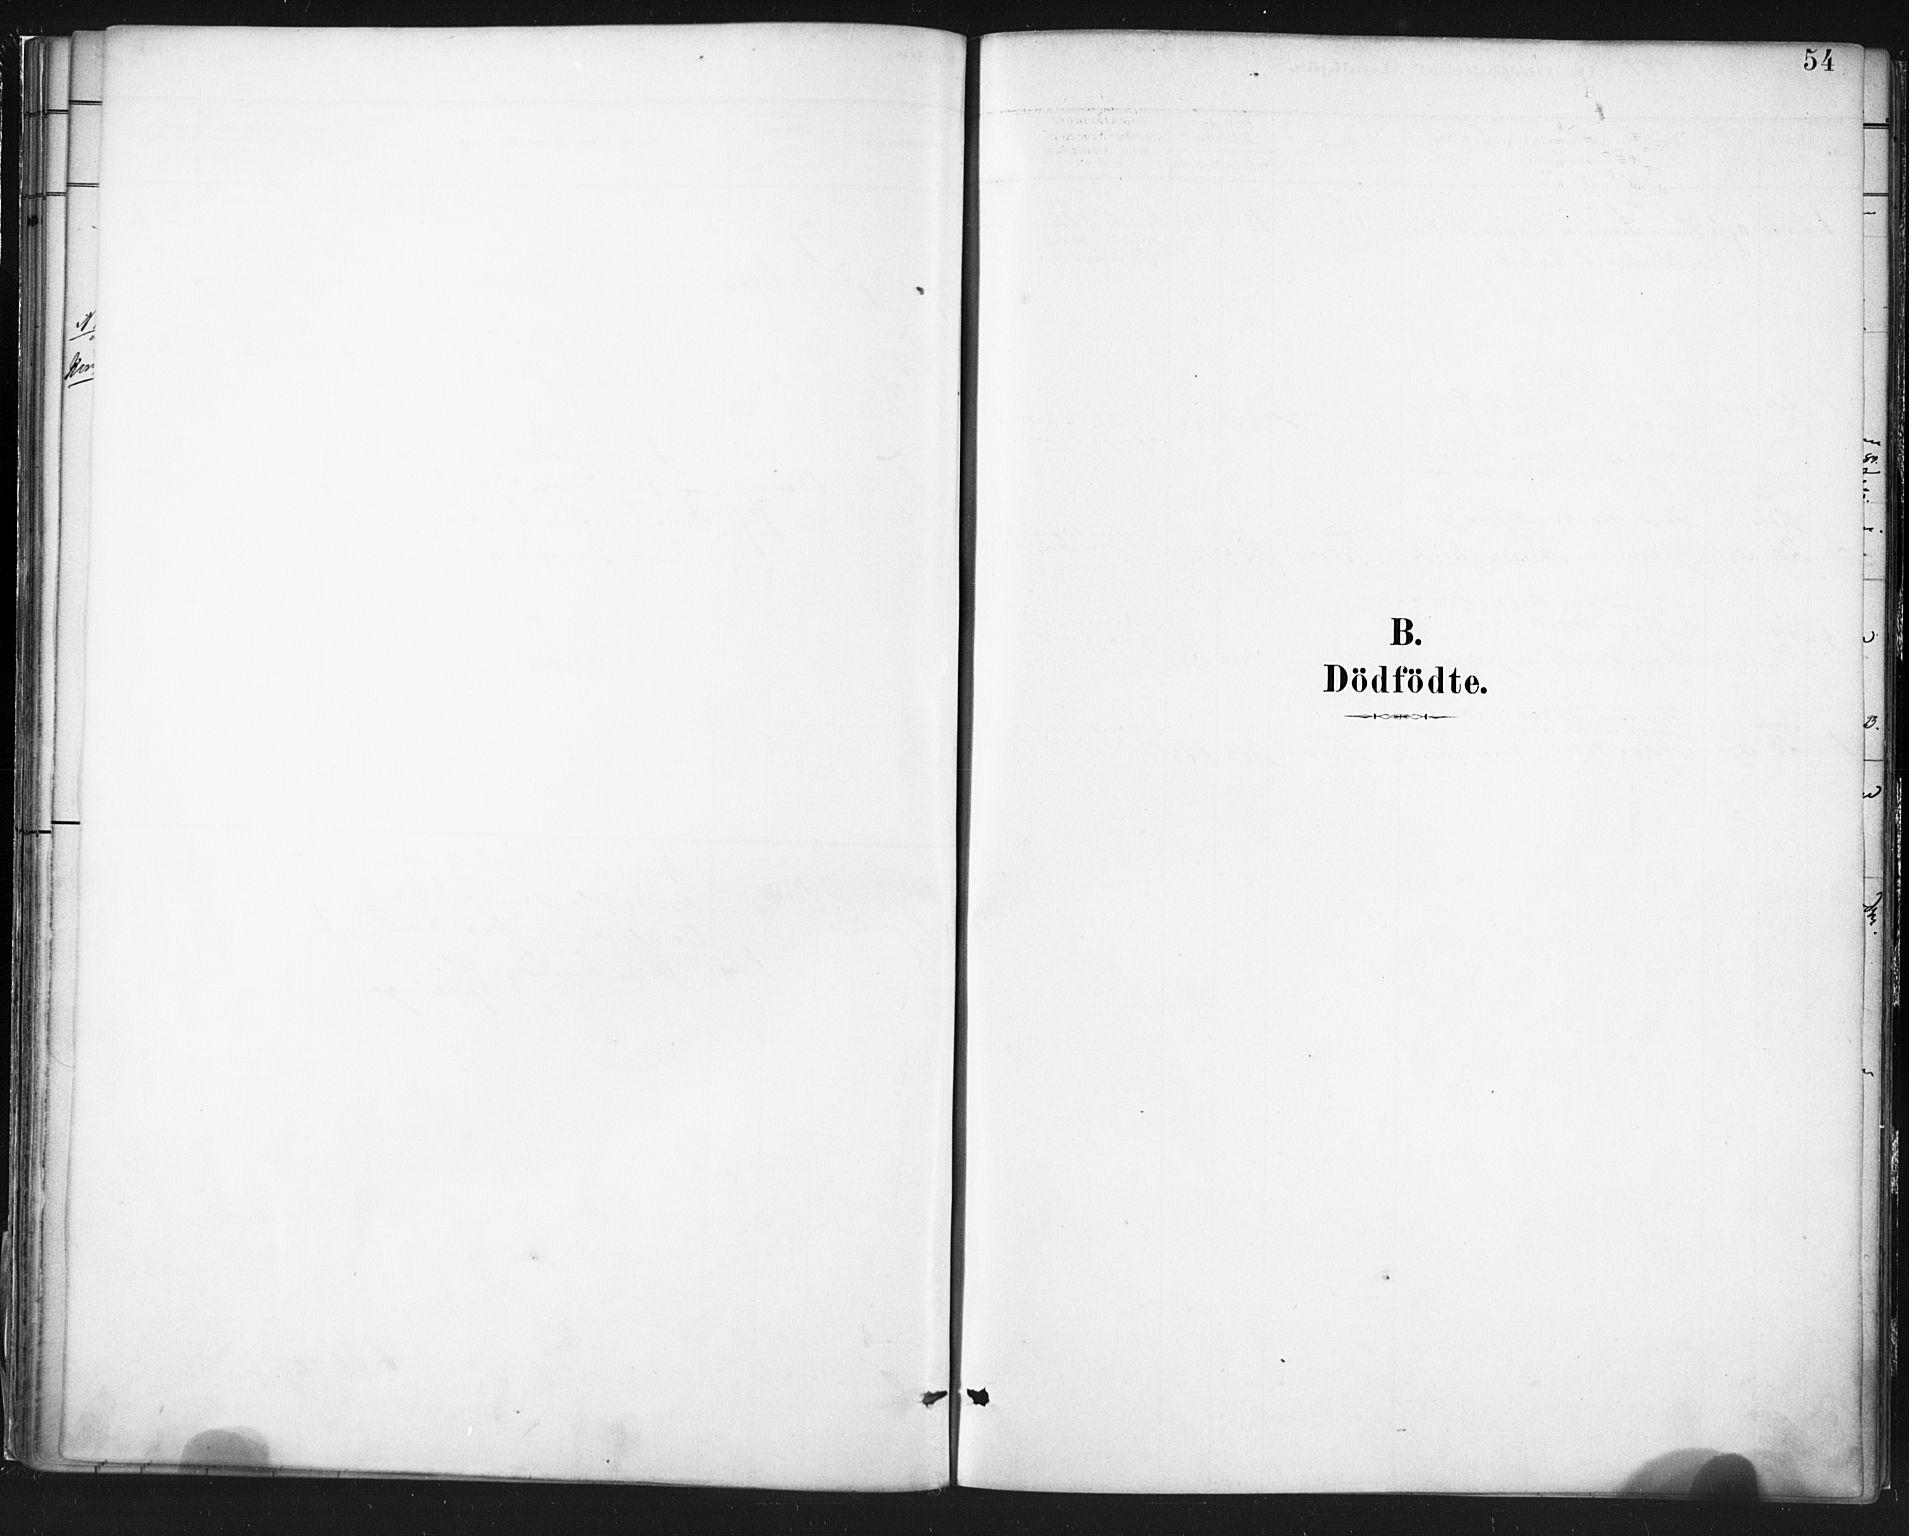 SAT, Ministerialprotokoller, klokkerbøker og fødselsregistre - Nordland, 803/L0071: Ministerialbok nr. 803A01, 1881-1897, s. 54